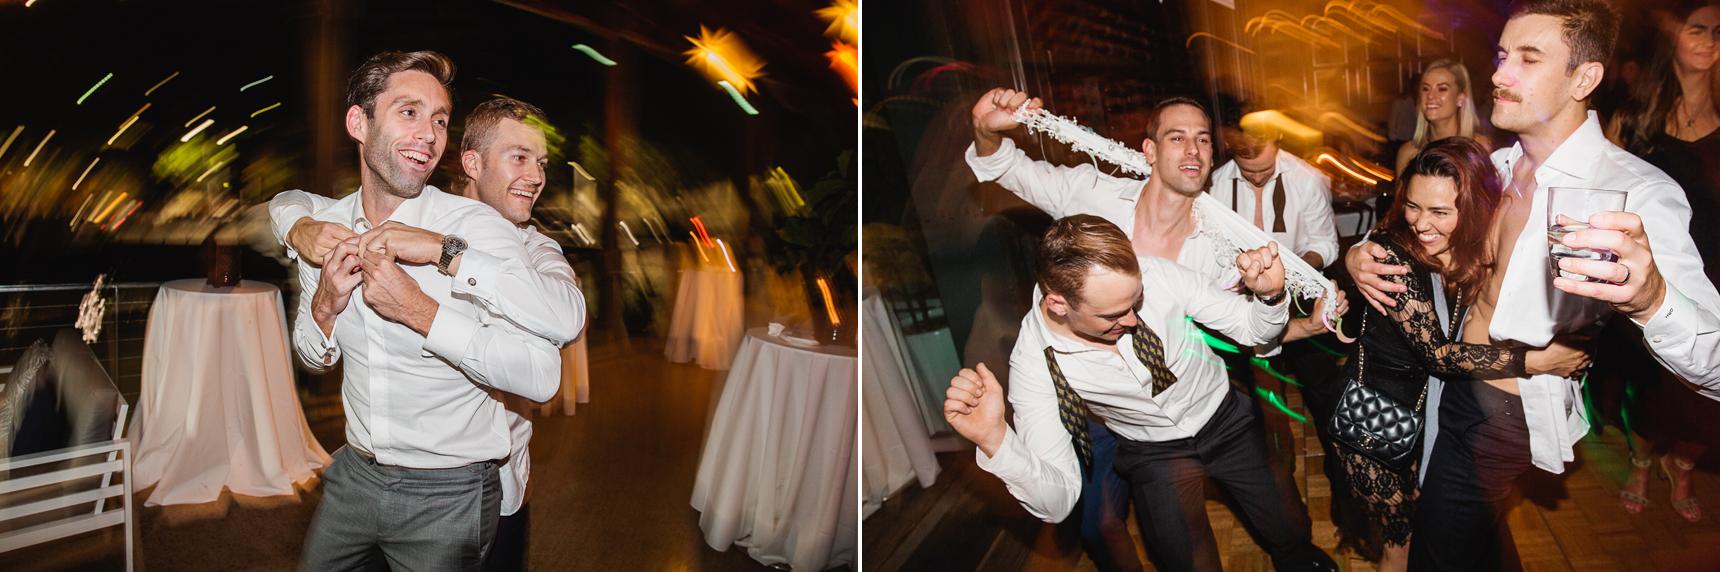 GregLana_ViewBySydney_WeddingPhotography112.jpg